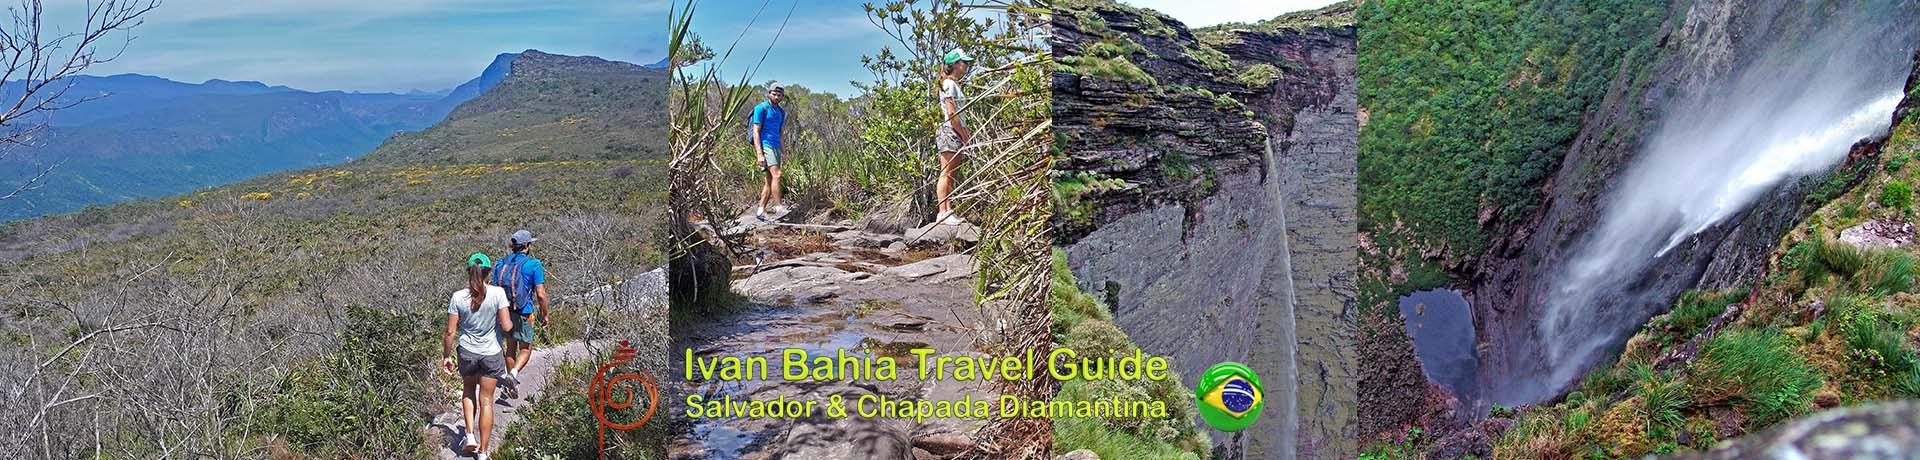 Ivan Bahia & Chapada Diamantina guide / Parc National Chapada Diamantina (connu comme le 'Grand Canyon Brésilien') / #ibtg #ibg #ivanbahiaguide #ivanbahiatravelguide #zenturturismo #ivanchapadadiamantinaguide #valedopati #patyvalley #pati #viapati #valecapao #ivanchapadaguide #chapadadiamantinatransfer #chapadatrekking #chapadaroots #chapadasoul #lencoisbahia #chapadadiamantinatrekking #ivanchapadadiamantinaguide  #chapadadiamantinaguide  #guidechapadadiamantina #lencois #lençois #chapadaadventuredaniel #diamondmountains #zentur # #guiachapadadiamantina #chapadaaventure #discoverchapada #chapadadiamond #chapadasoul #diamantinatrip  #tripadvisor #bahiametisse, #fernandobingre, #ivansalvadorbahia #salvadorbahiaTravel #toursbylocals #fotosbahia #bahiafotos #chapadadiamantinanationalpark #yourtoursbrazil #maurotours #bahiatopturismo #bahiapremium #maisbahiaturismo #fernandobingretourguide #cassiturismo